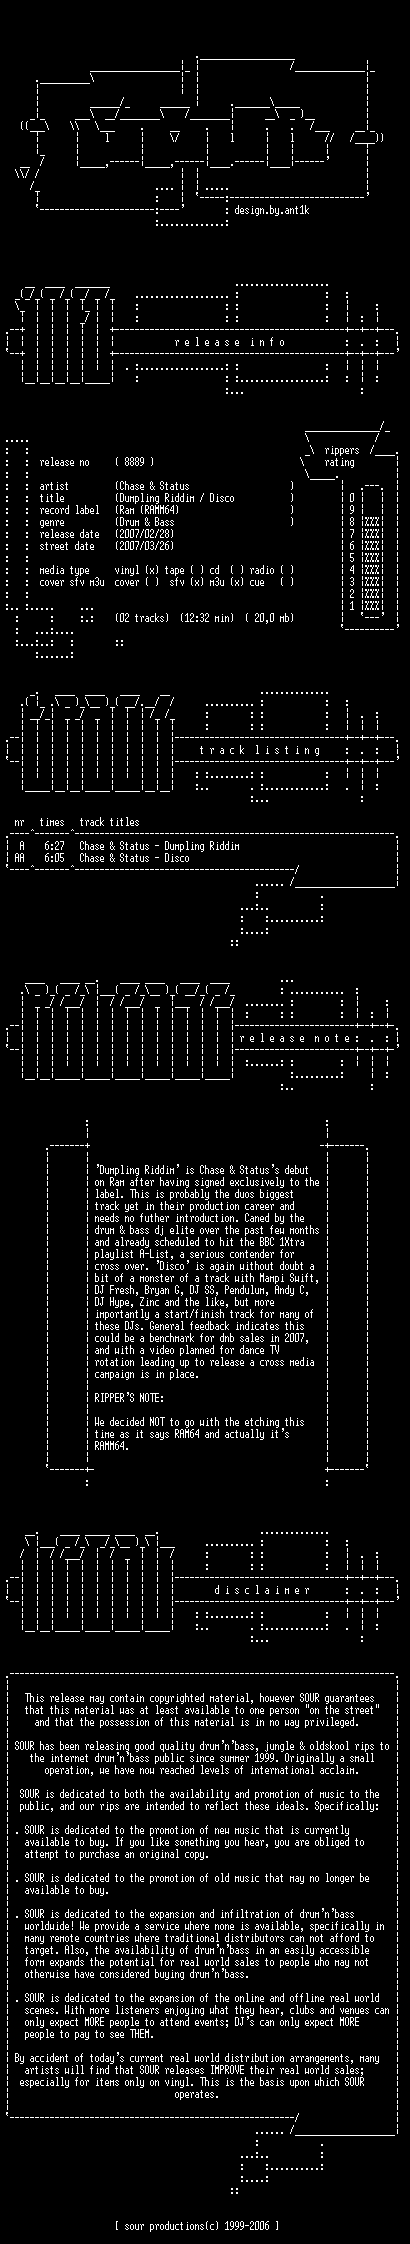 [DnB] Chase & Status - RAMM64 - Ramm Rec. Ramm6410